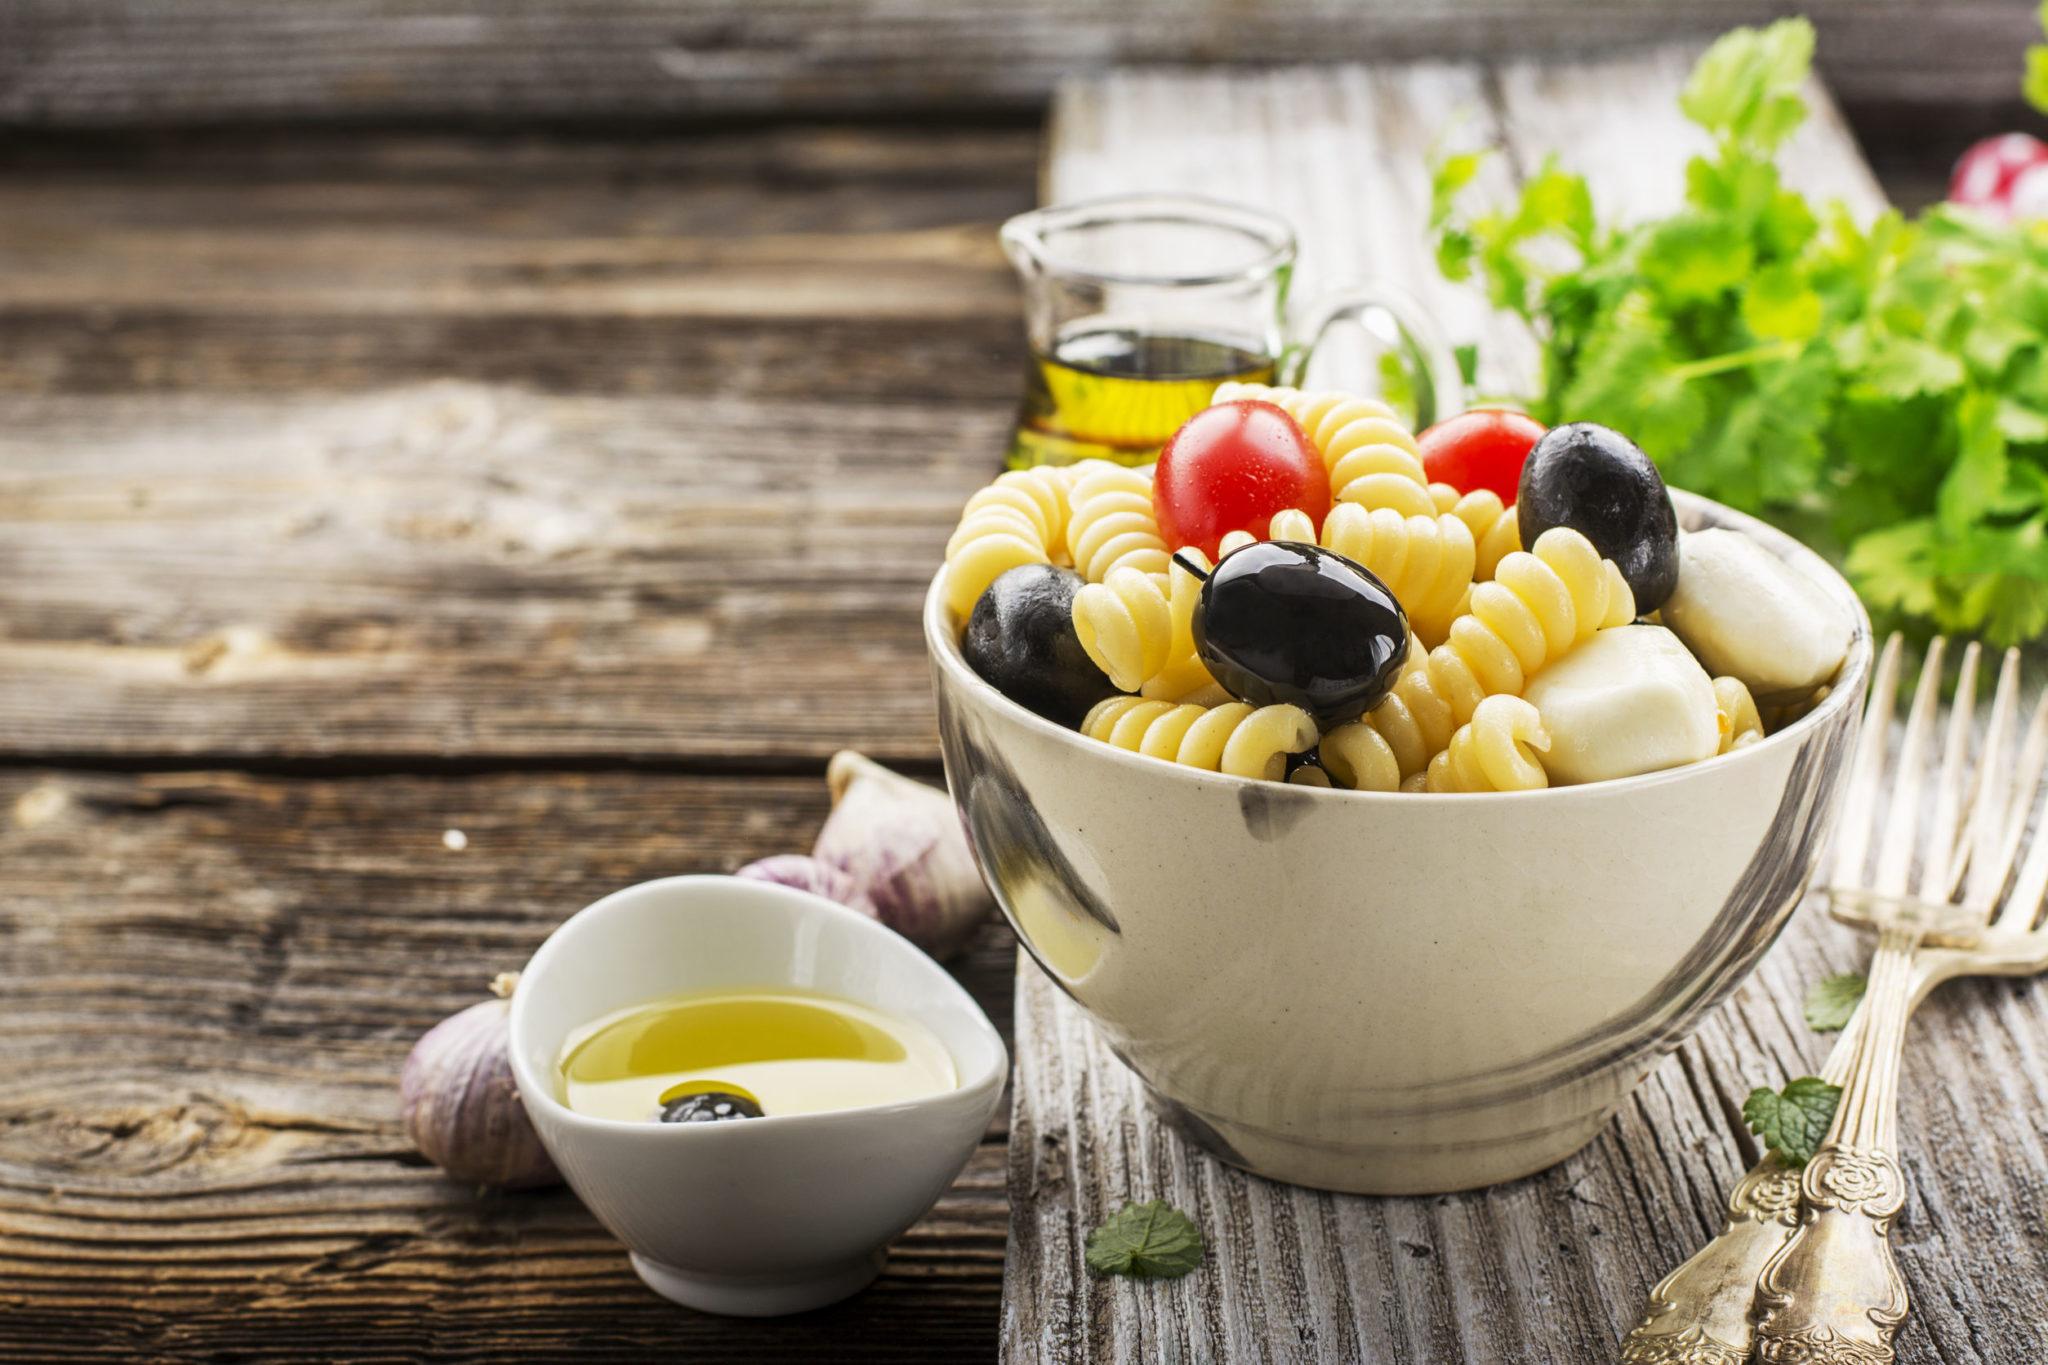 Pasta summer edition: light recipes of pasta with no regrets